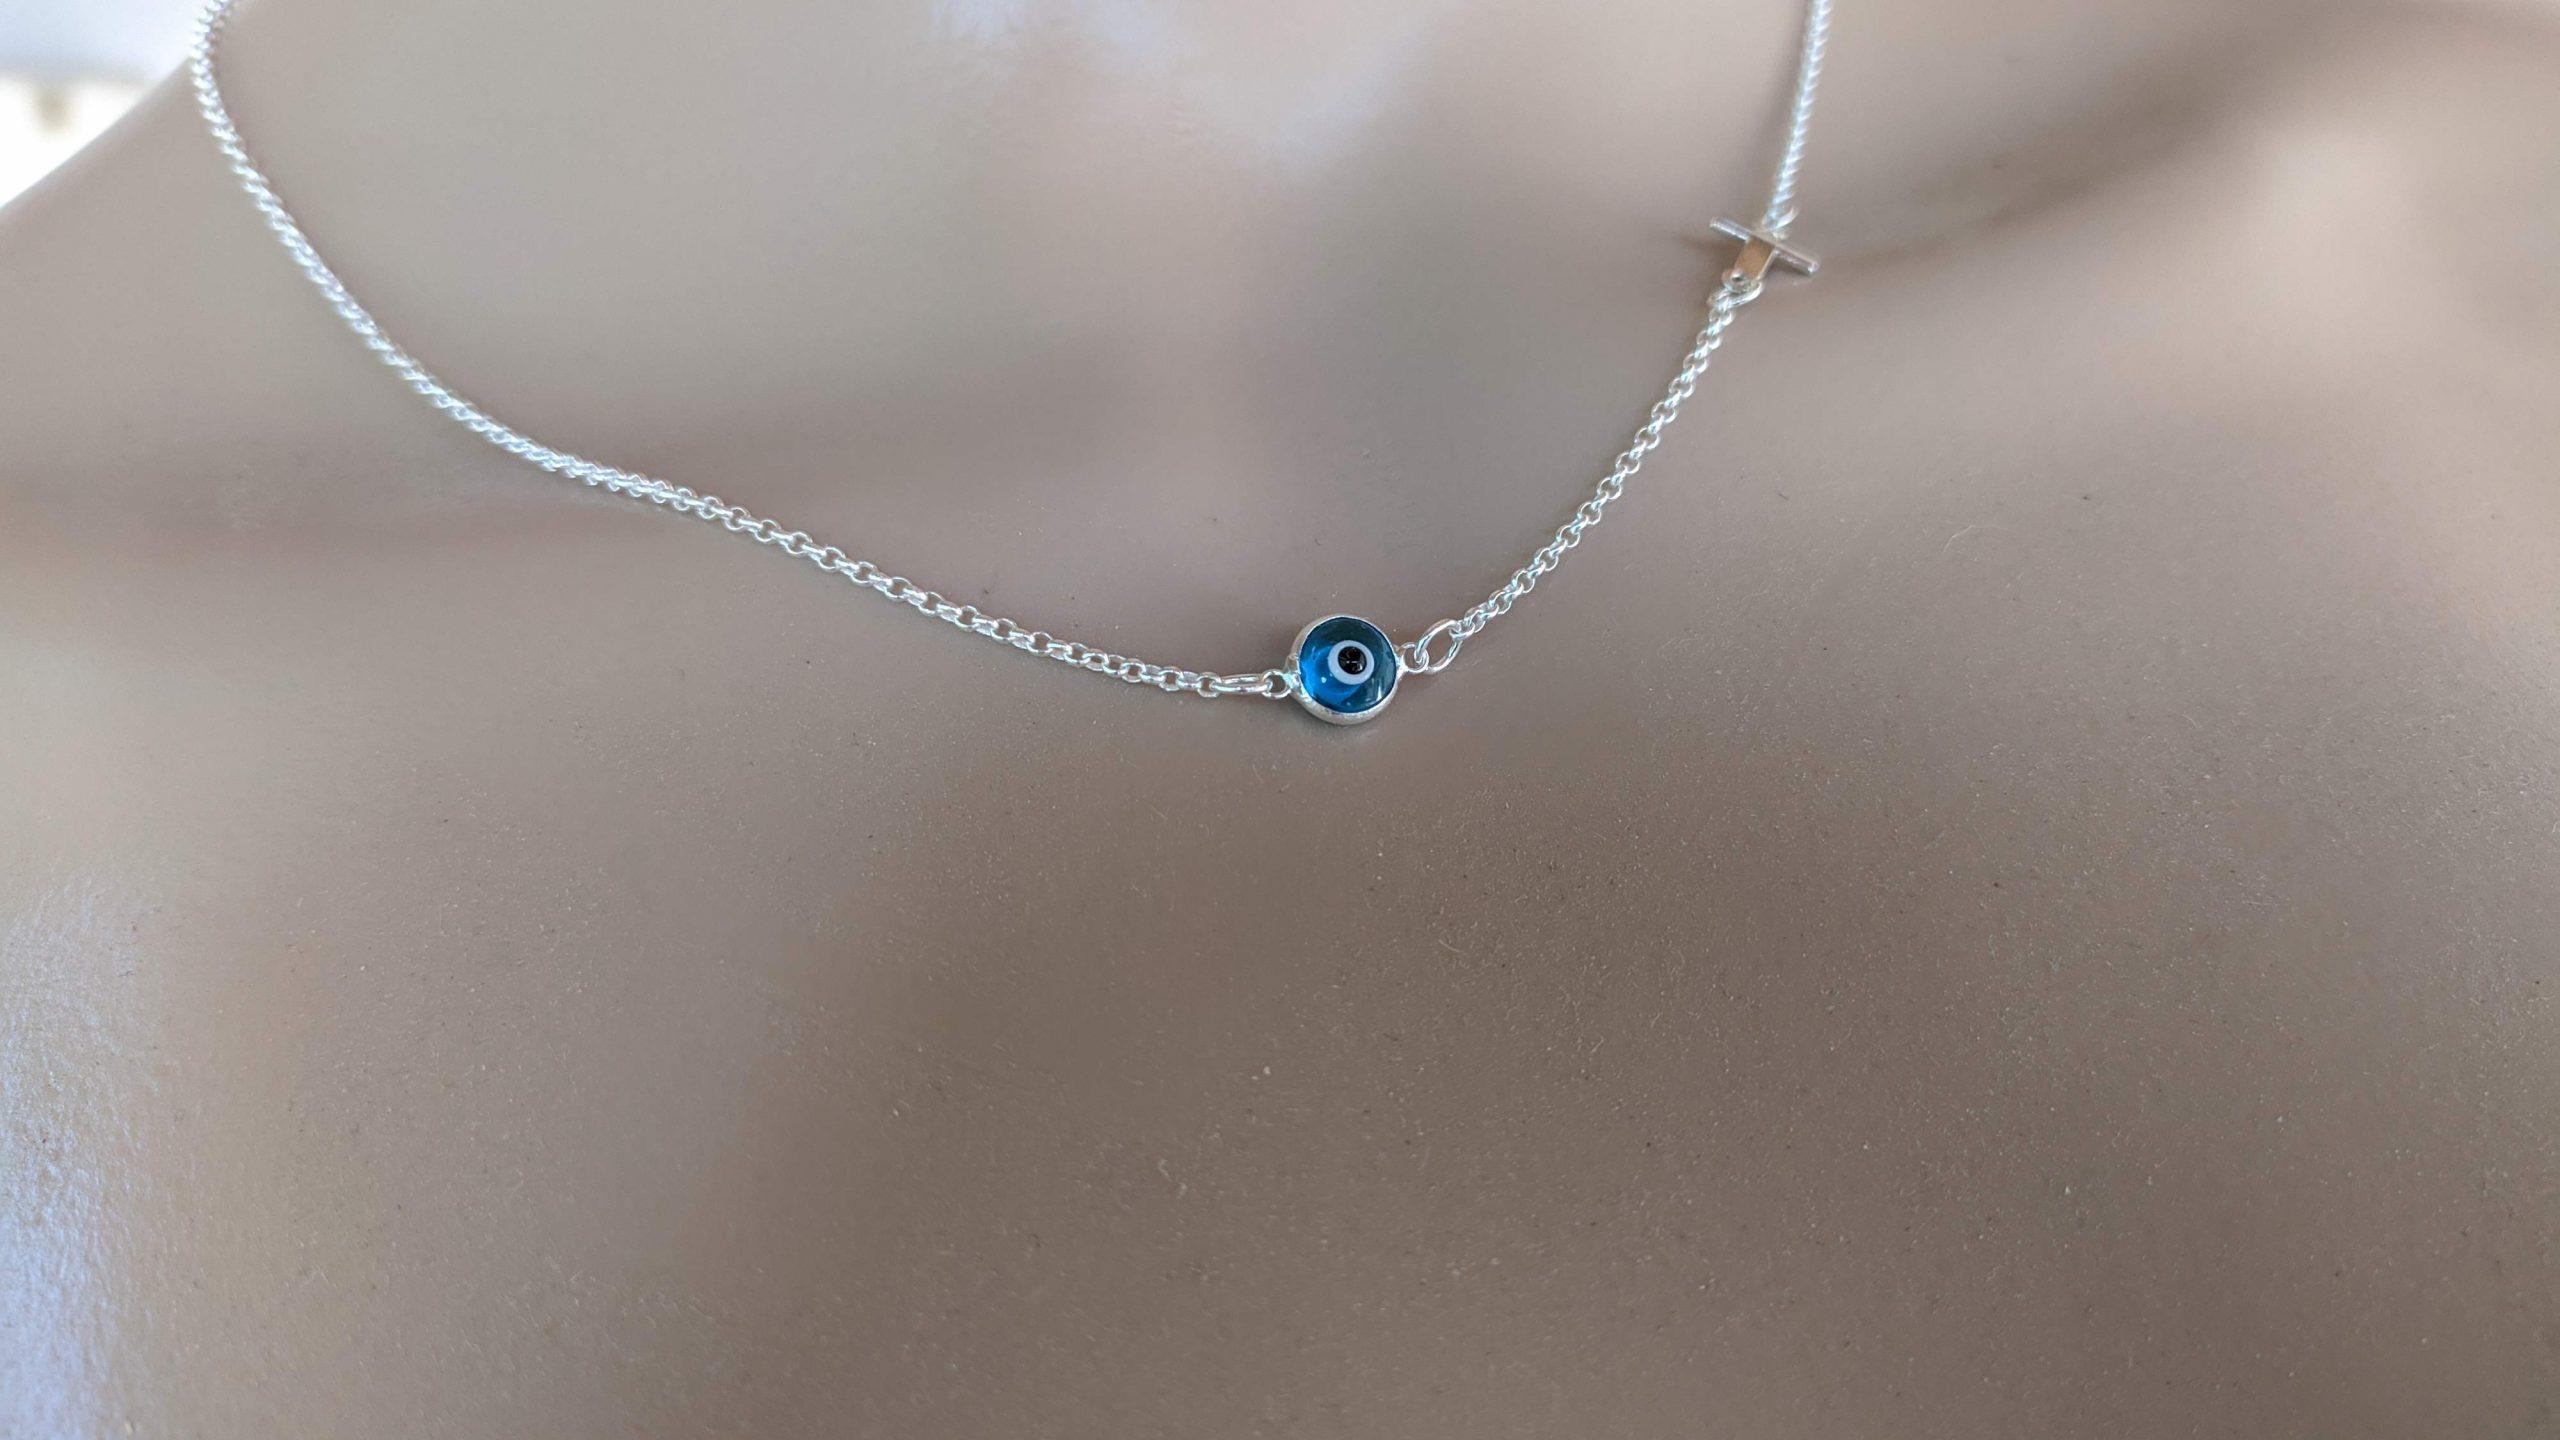 evil eye cross necklace in sterling silver